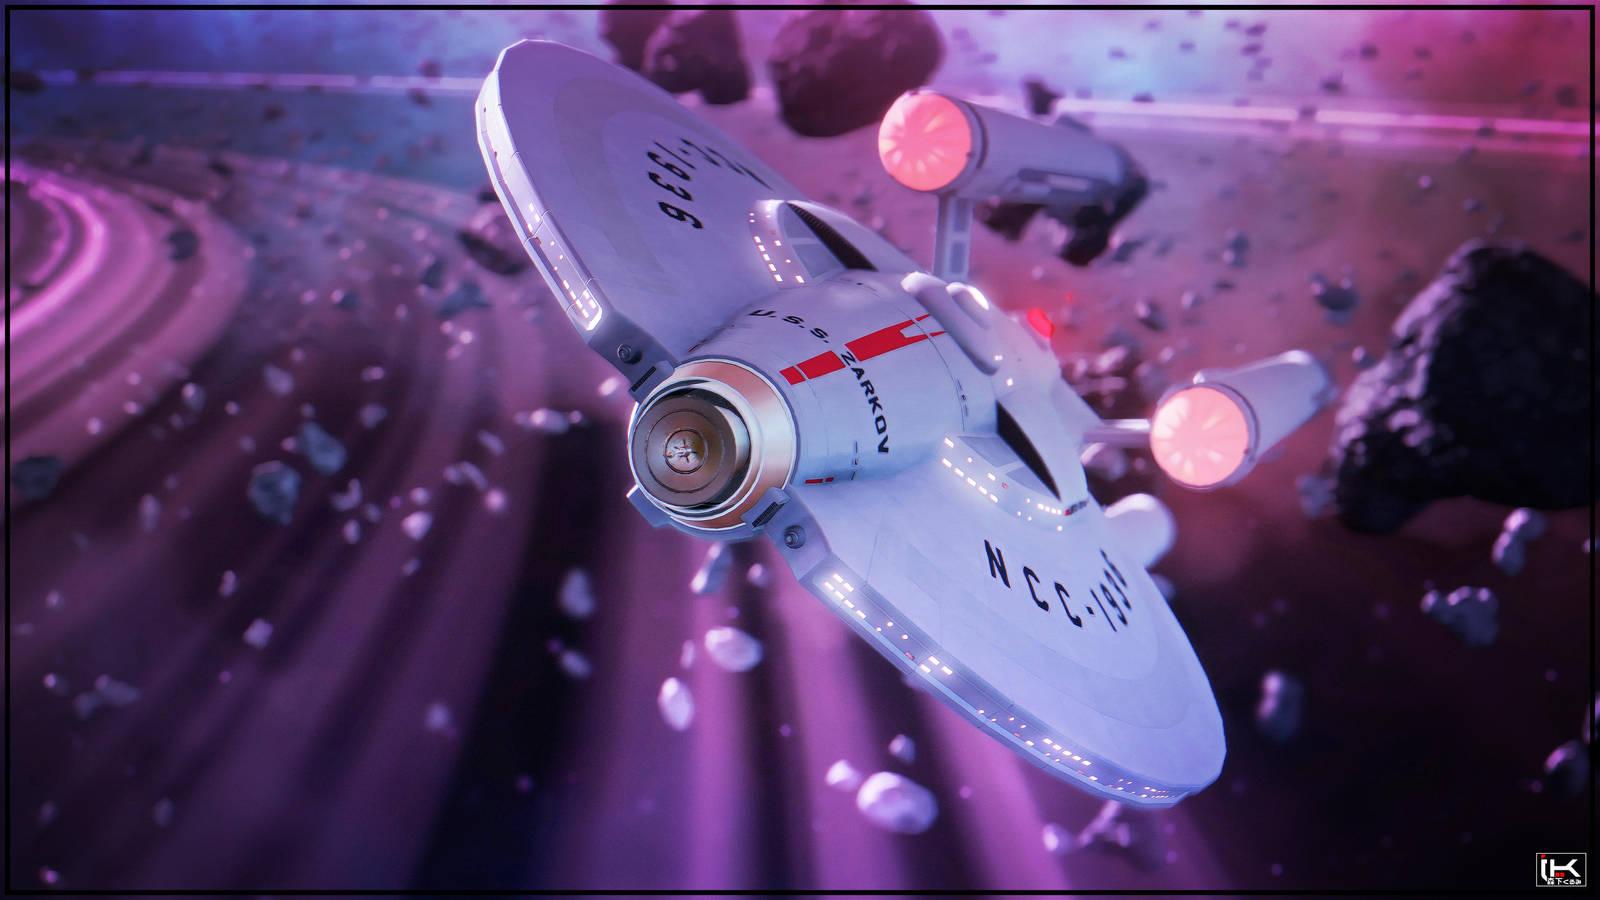 rocketing_to_earth_by_kurumi_morishita_dbx71jj-fullview.jpg